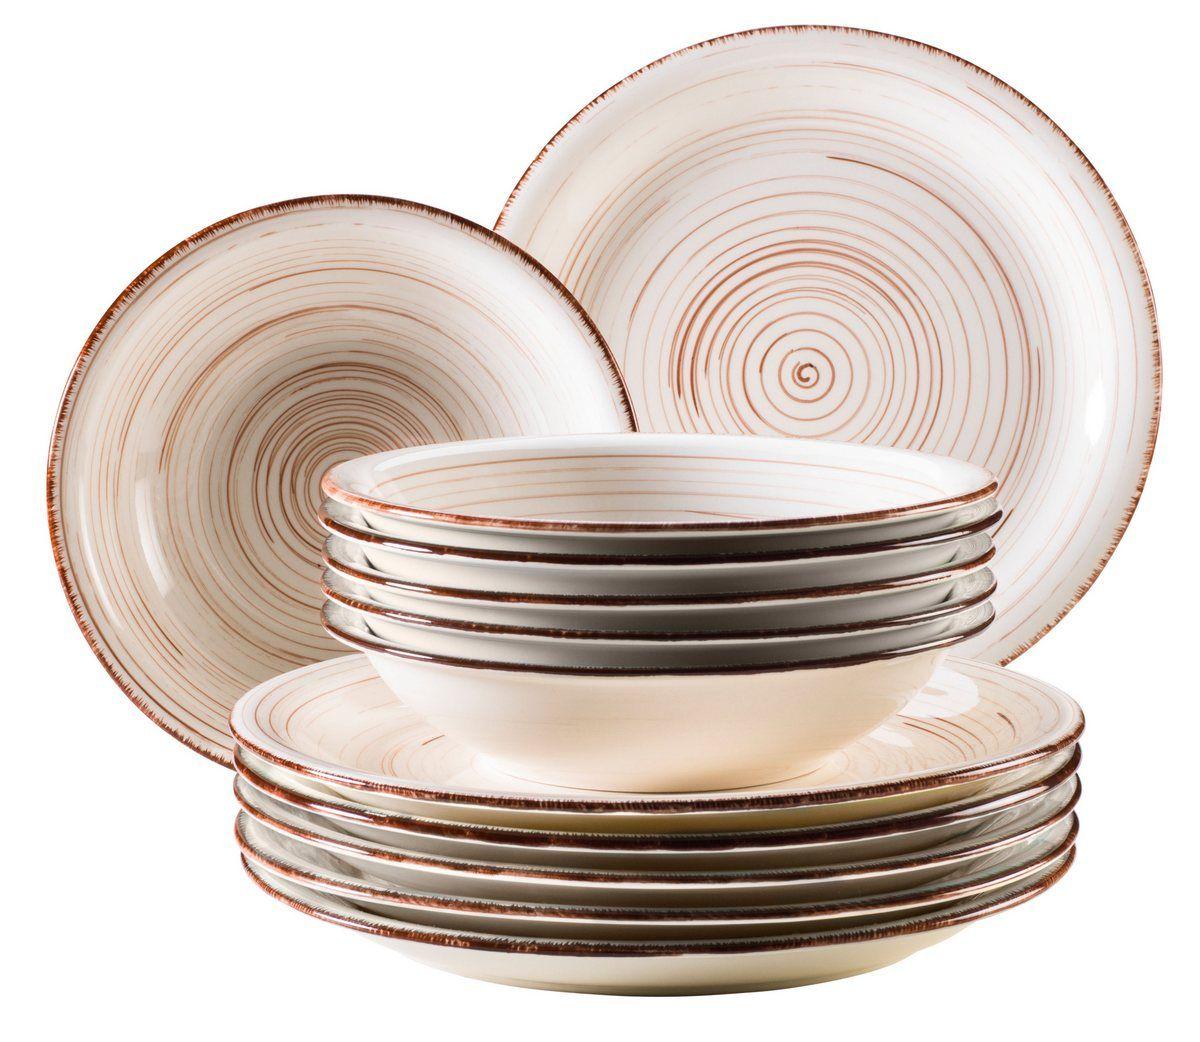 MÄSER Set Tafelservice, Keramik »BEL TEMPO« 12teilig